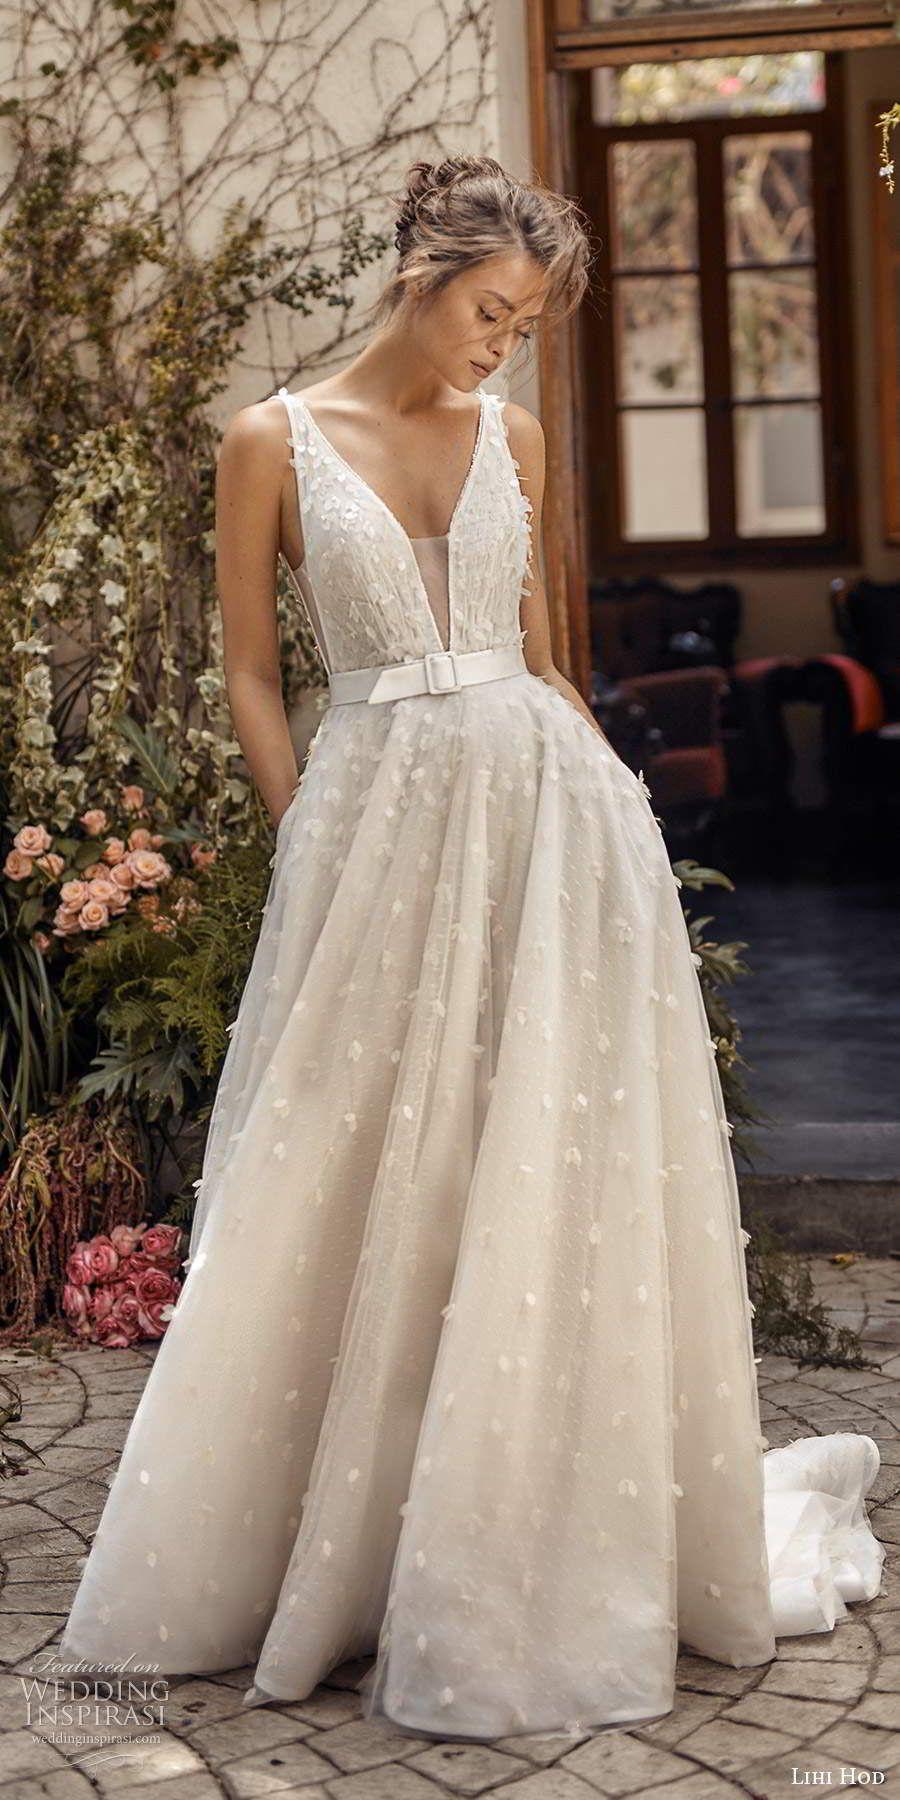 Lihi Hod Fall 2020 Wedding Dresses White Blossom Bridal Collection Wedding Inspirasi Goddess Wedding Dress Extravagant Wedding Dresses Black Wedding Dresses [ 1800 x 900 Pixel ]